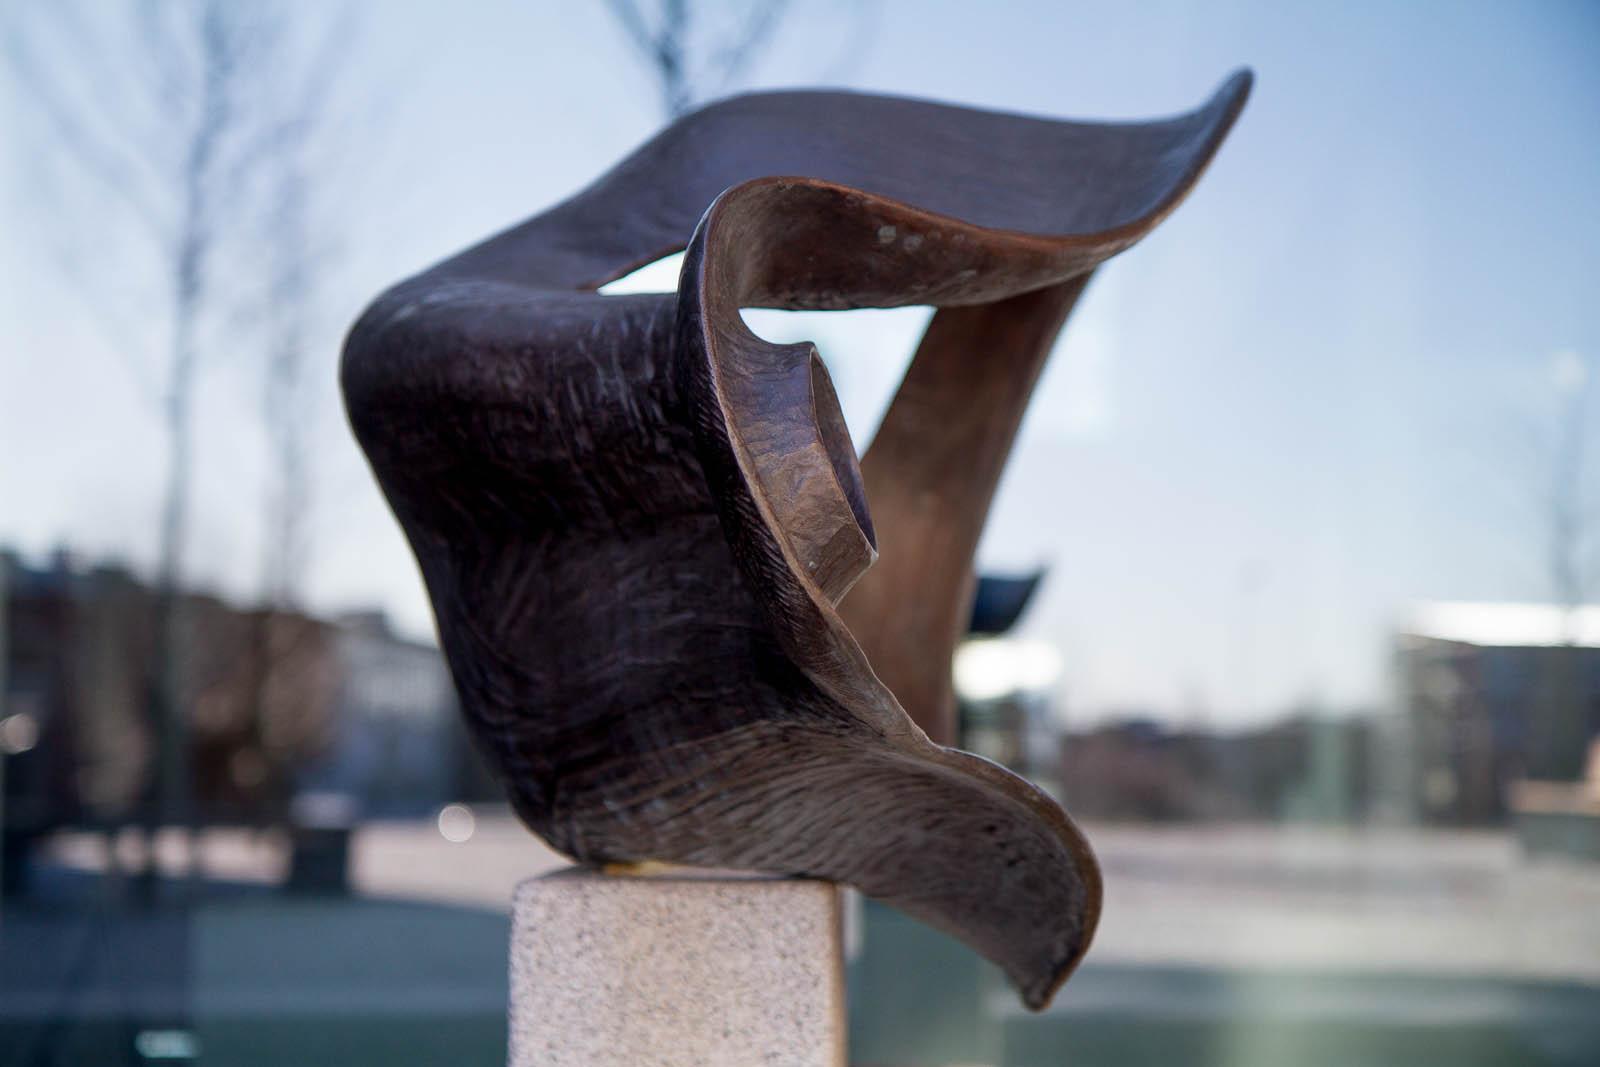 Bronsskulptur med rundade former. Carl Boutard, Into The Wild (2013)